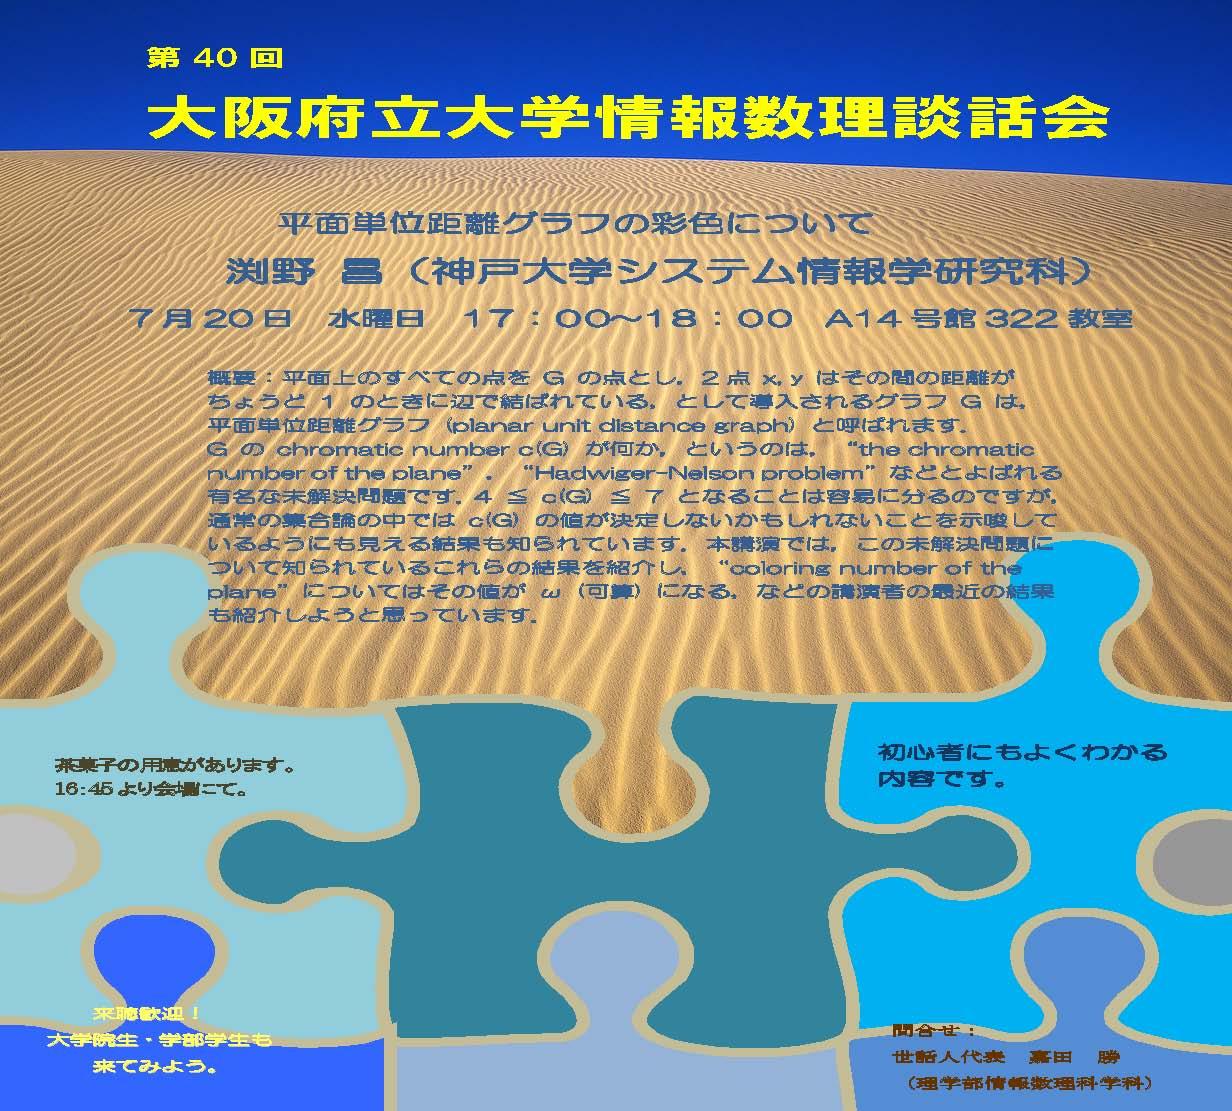 Sakaé Fuchino's Web Page in Ko...